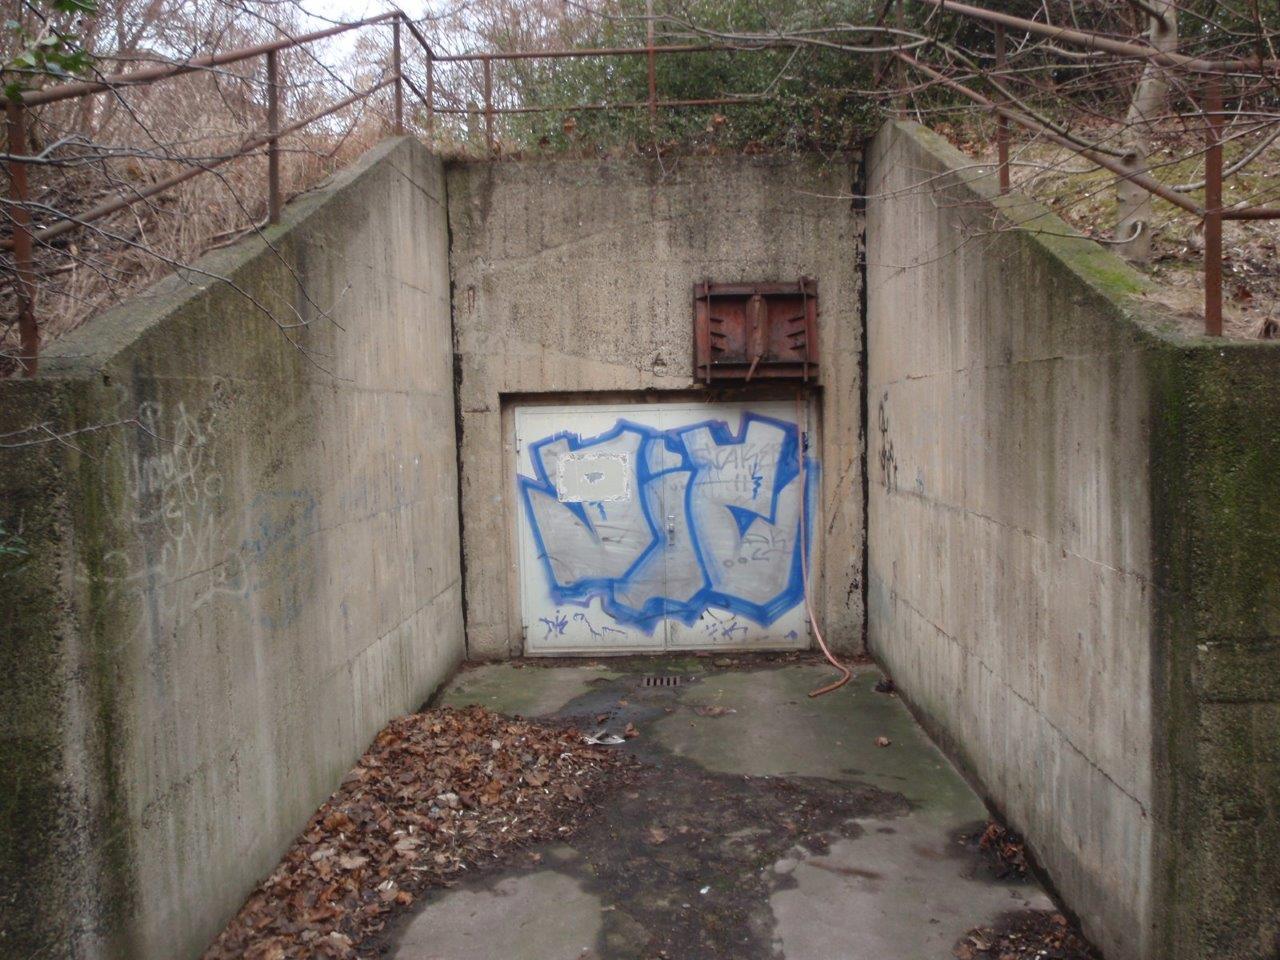 Grosser Eingang des Bunkers hinter der Ringbebauung in Leipzig